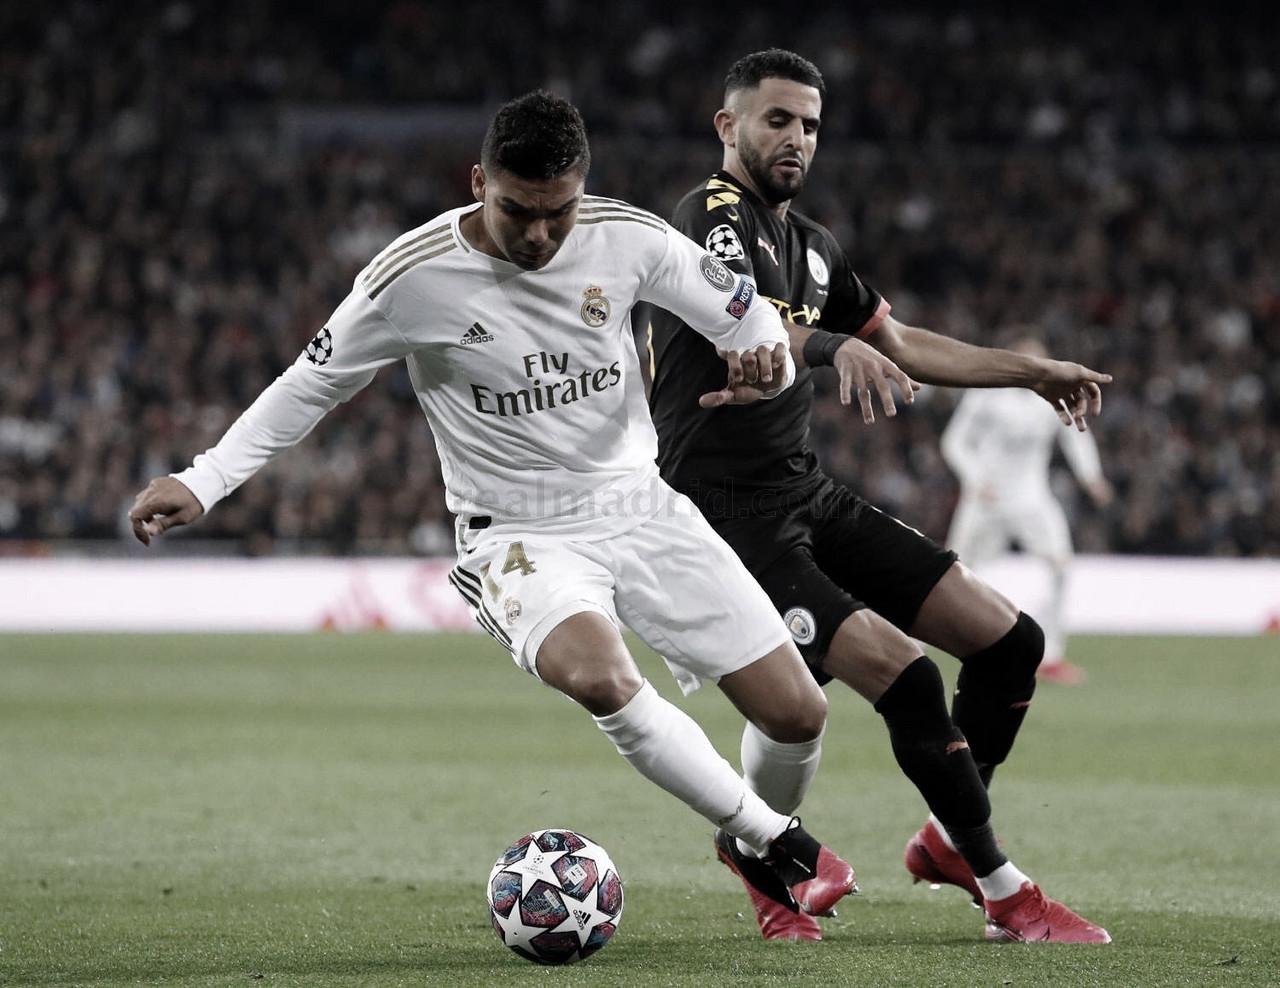 El Real Madrid llega a la Champions pisando el acelerador